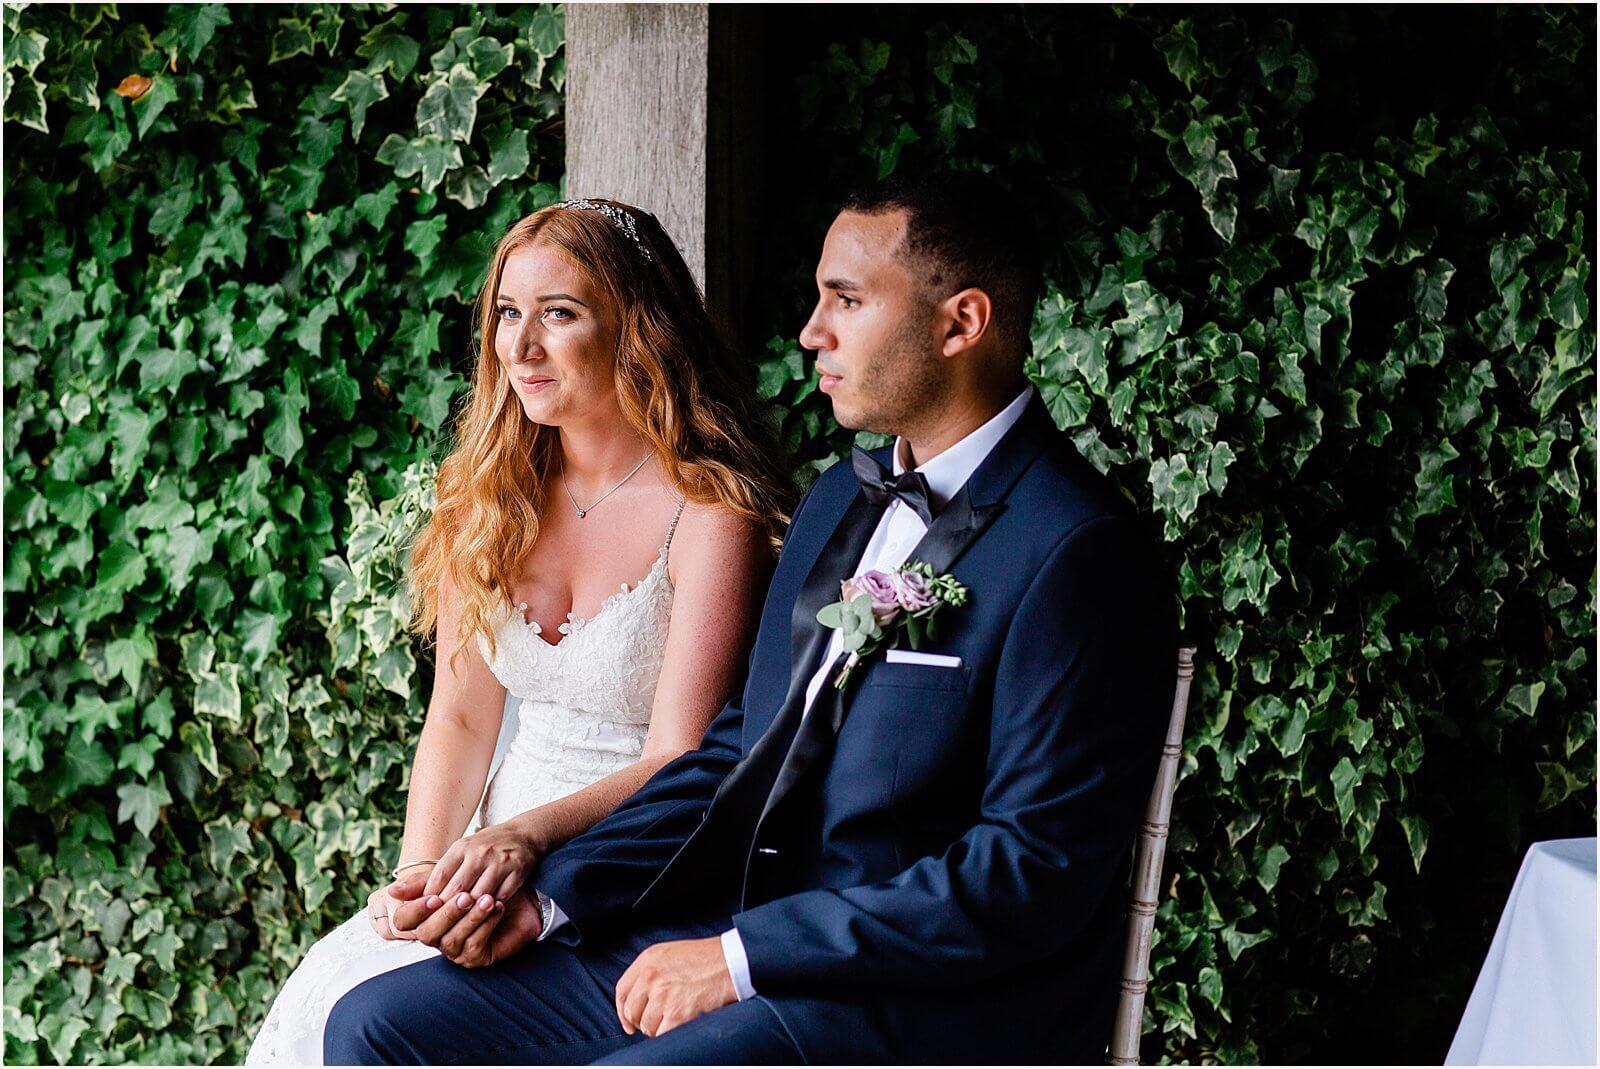 Swallows Oast Wedding - Jakki + Luke's barn wedding photography 26